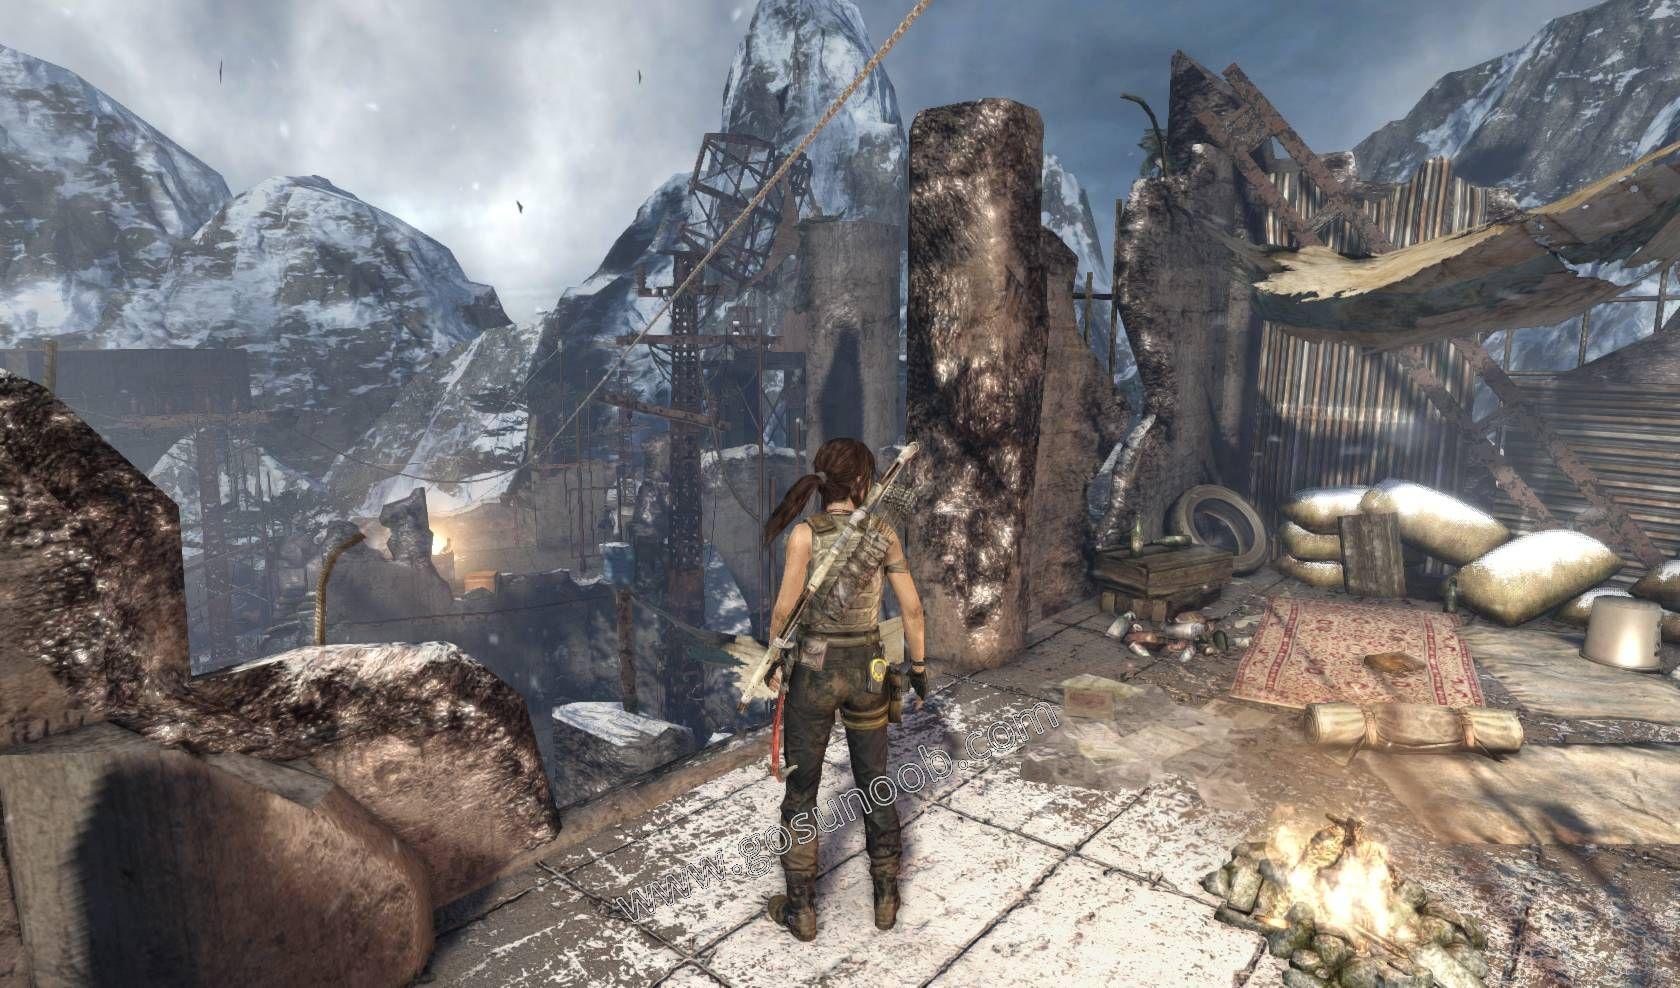 Base Exterior Treasure Map Gosunoob Com Video Game News